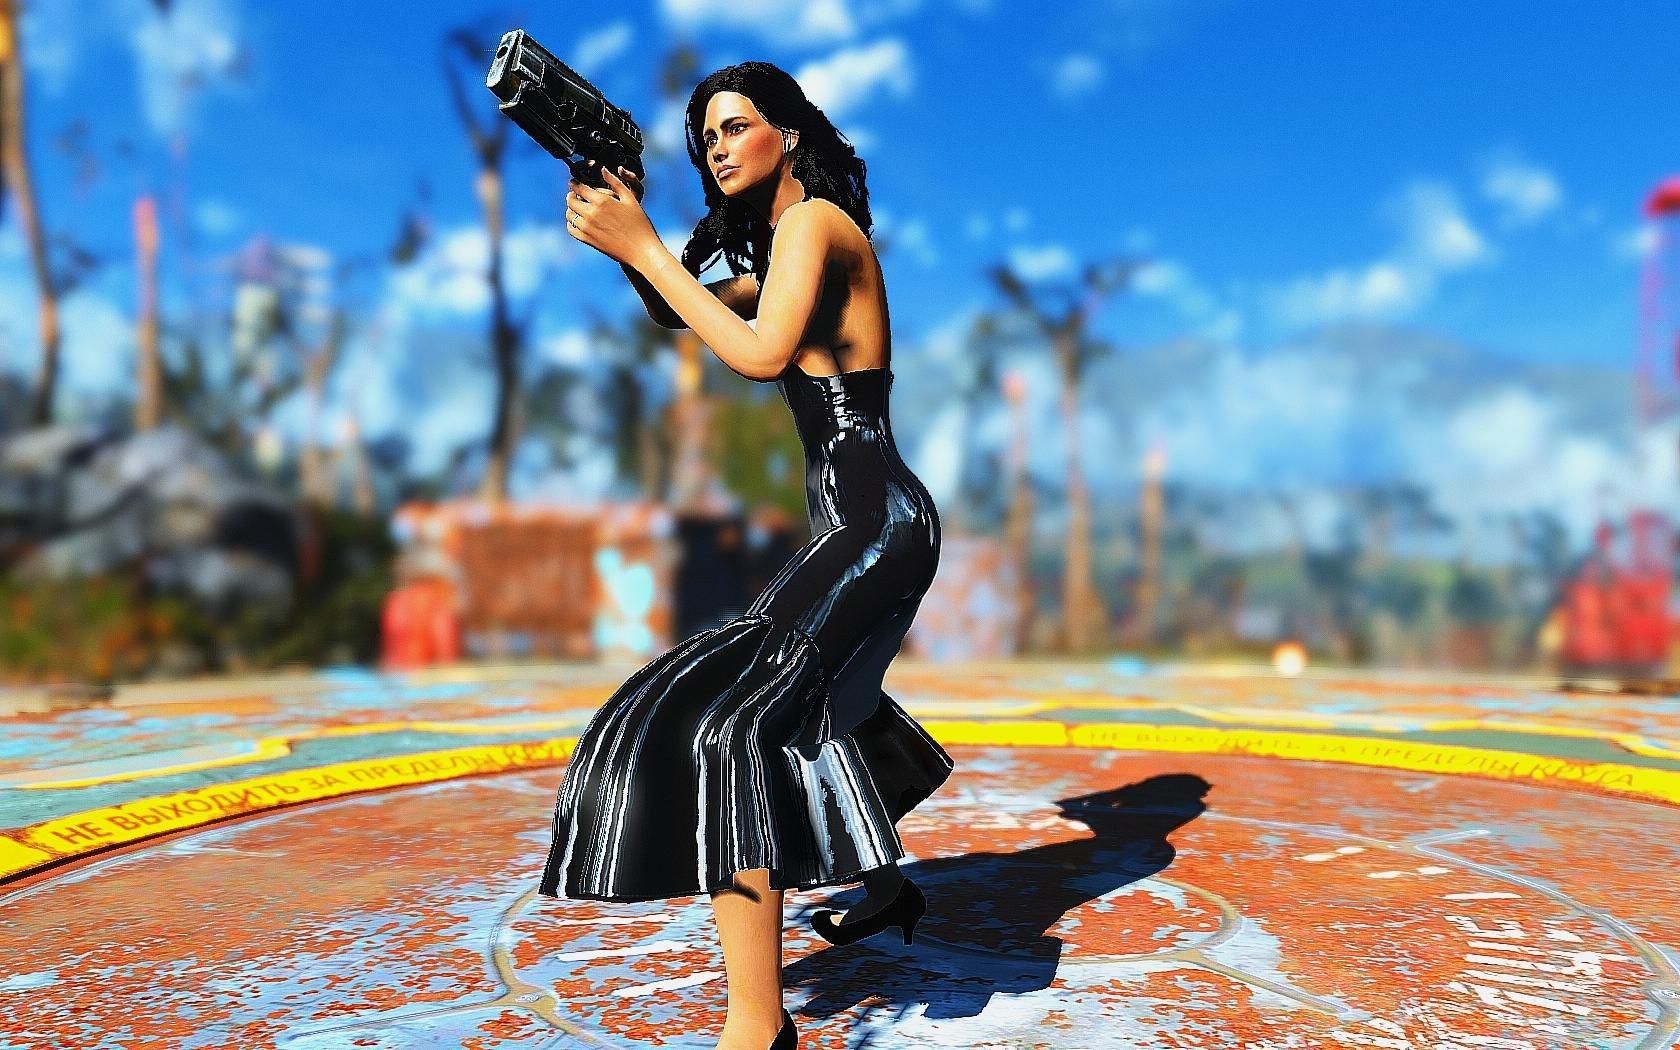 Fallout4 2019-02-11 13-28-27-18